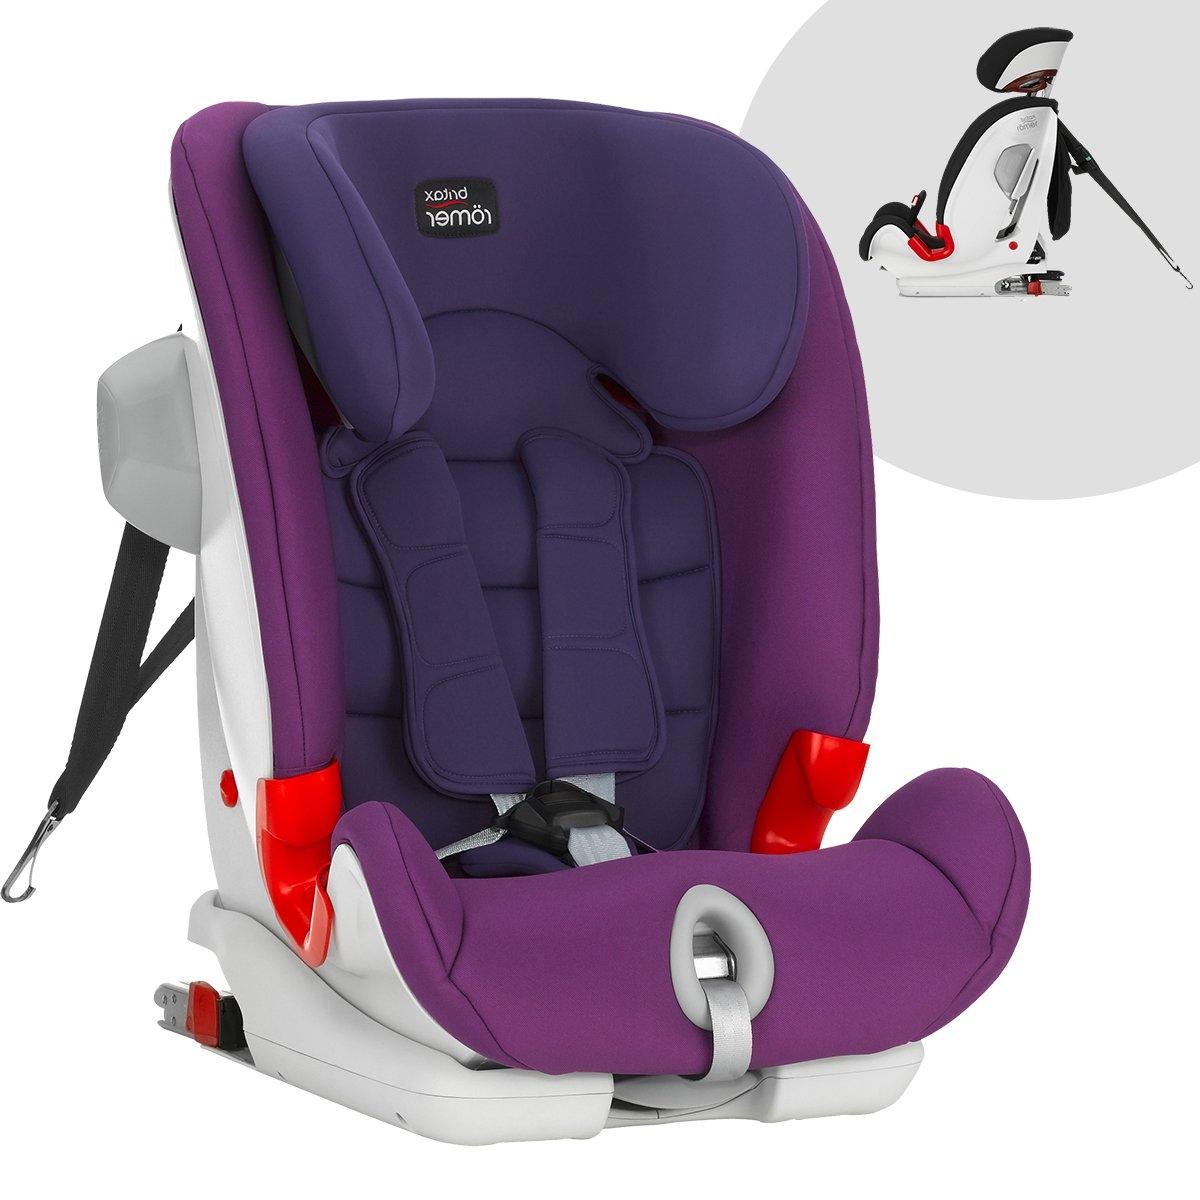 britax r mer advansafix 1 2 3 sict 9 36 kg isofix oto koltu u ayhan ocuk anne ve bebek. Black Bedroom Furniture Sets. Home Design Ideas